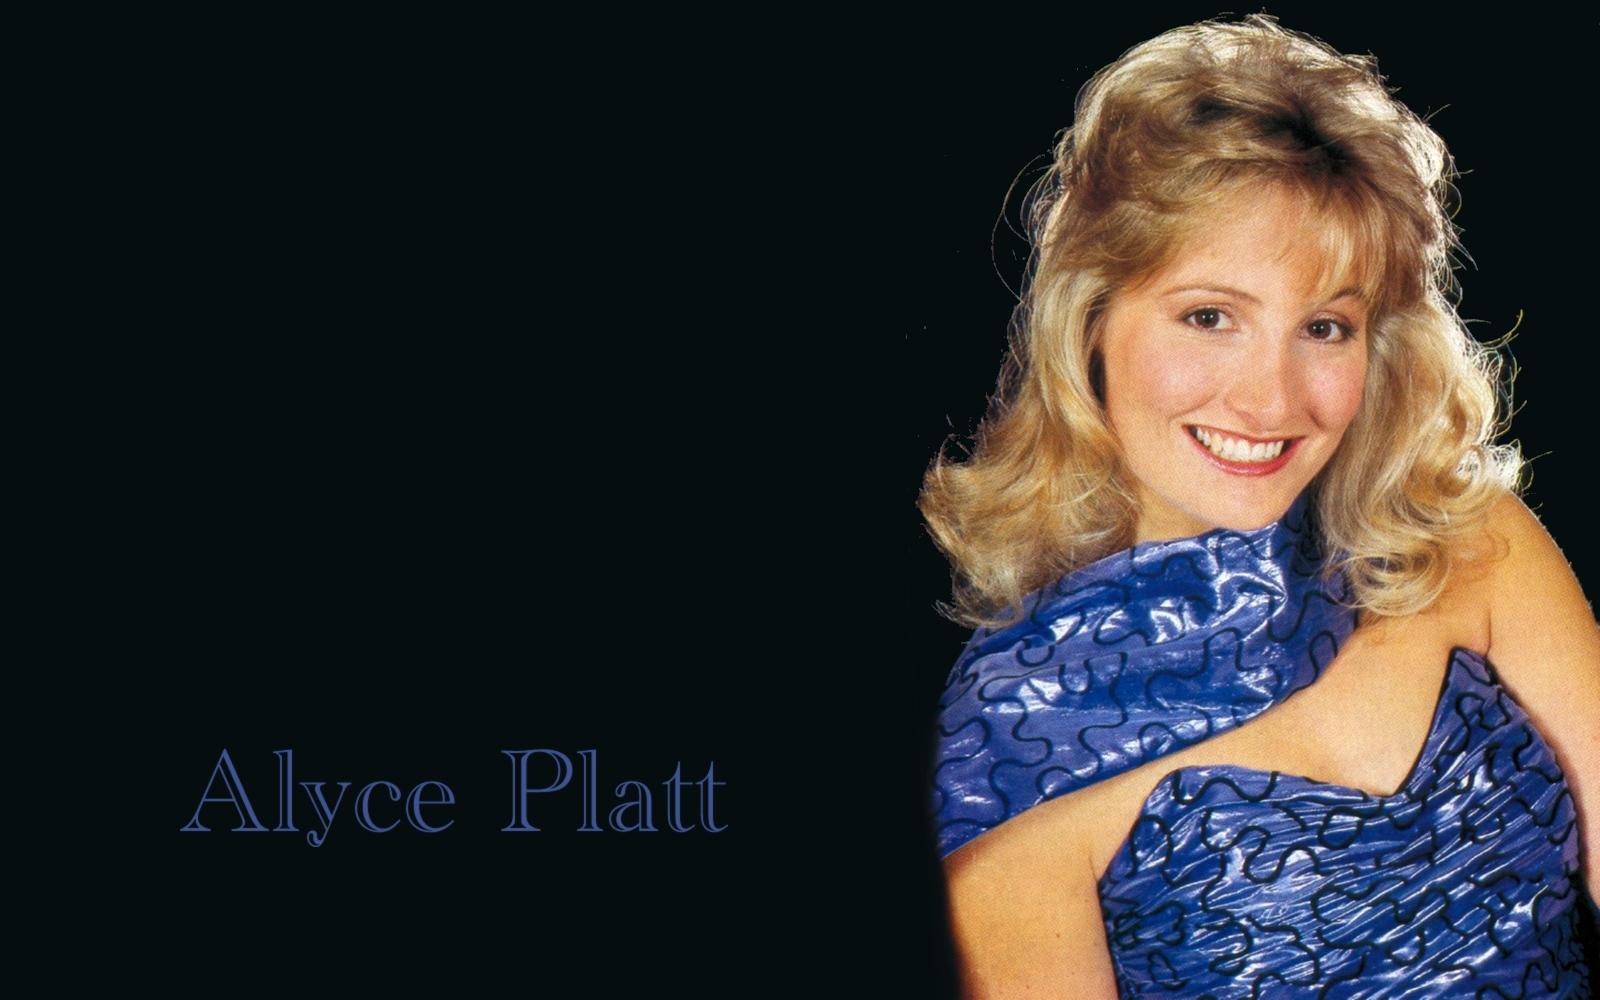 Alyce Platt Nude Photos 58